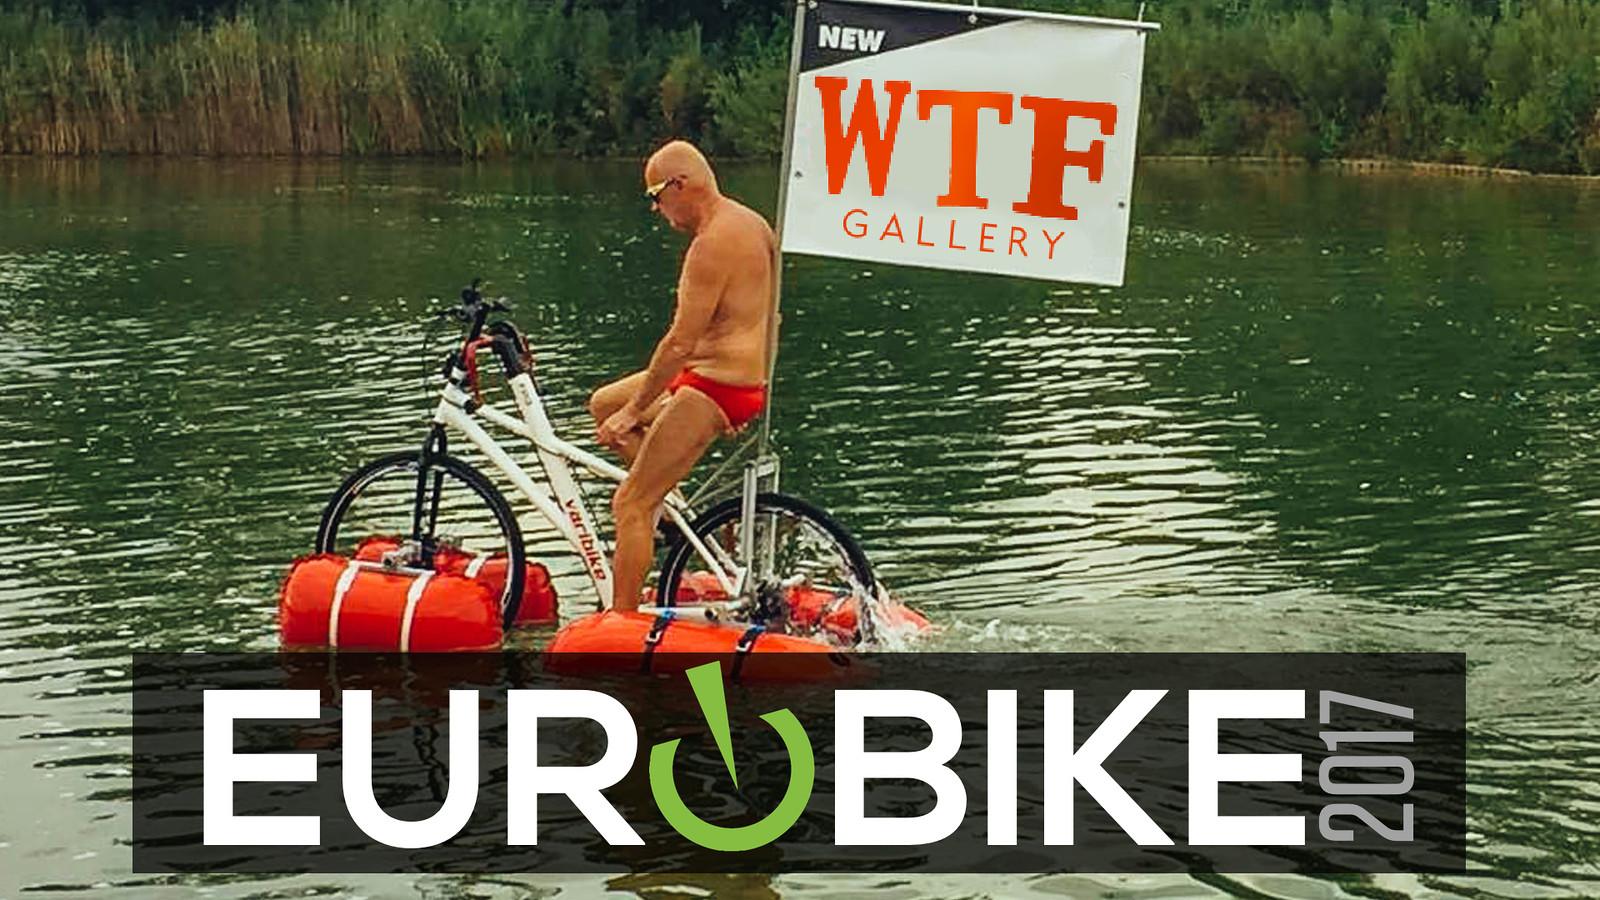 Eurobike WTF??? - iceman2058 - Mountain Biking Pictures - Vital MTB